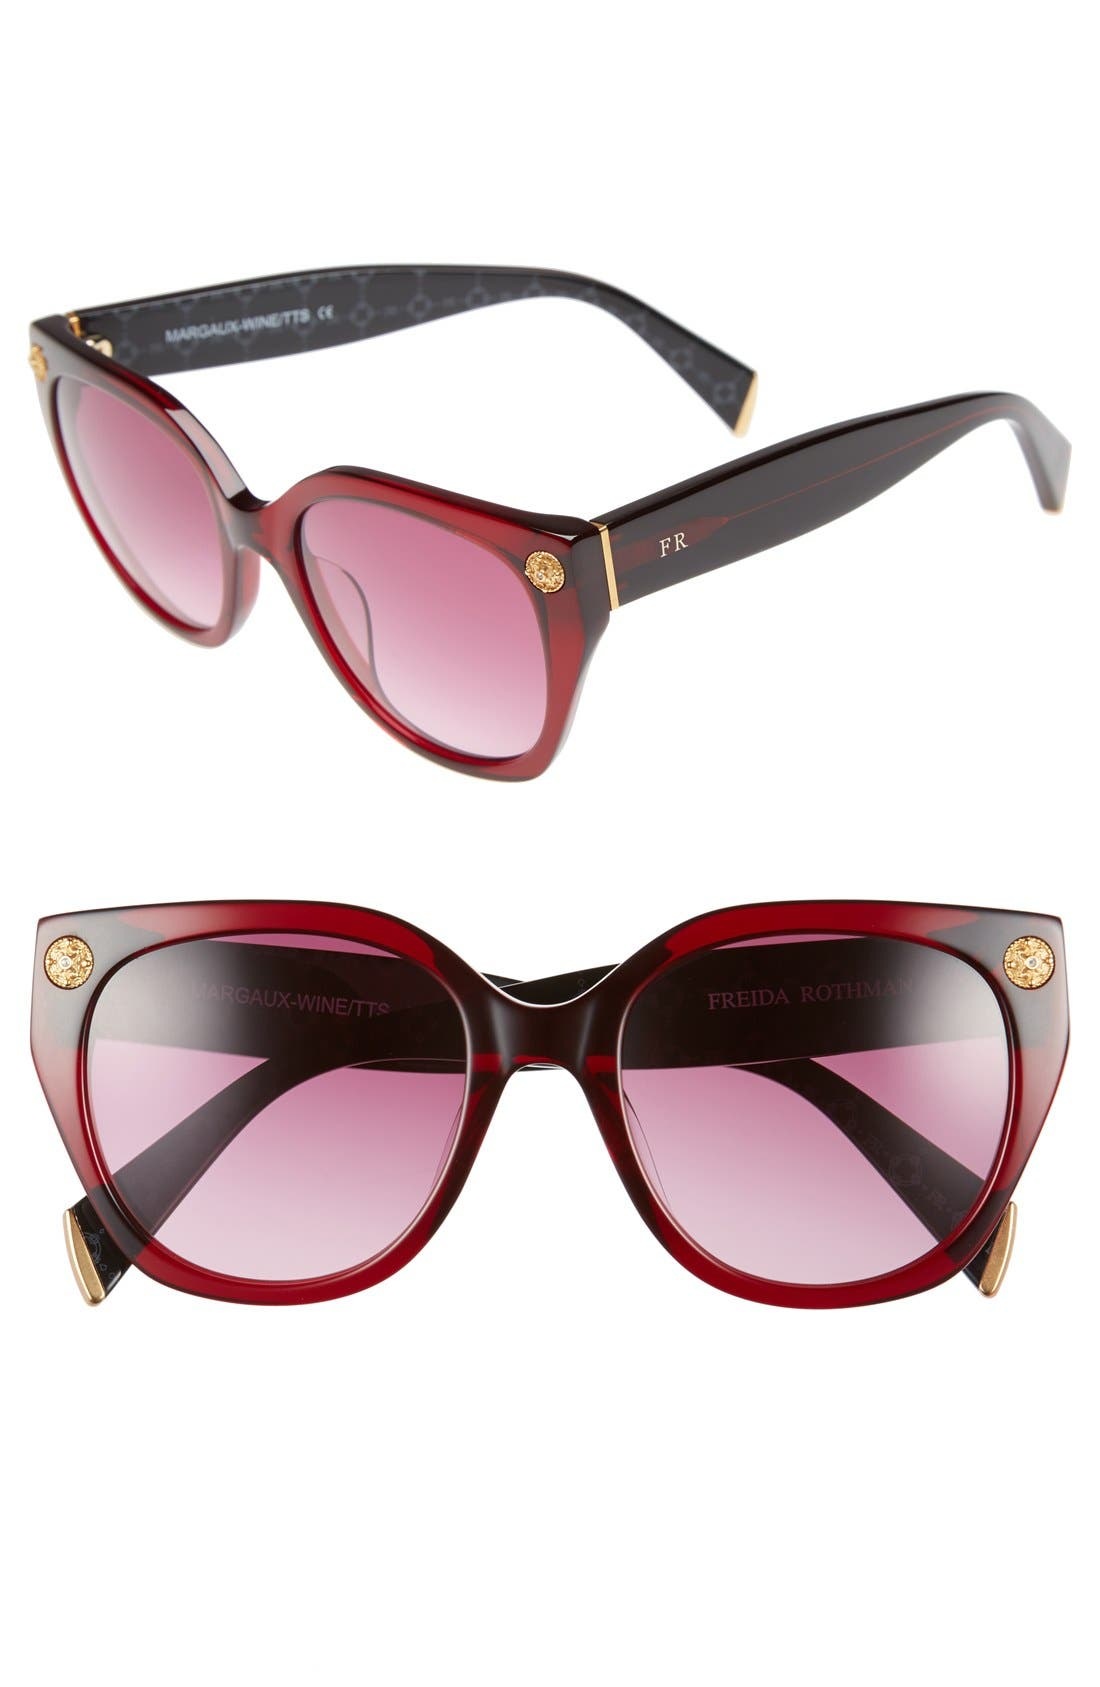 FreidaRothman'MargauxElegant' 54mmRetro Sunglasses,                         Main,                         color, Wine